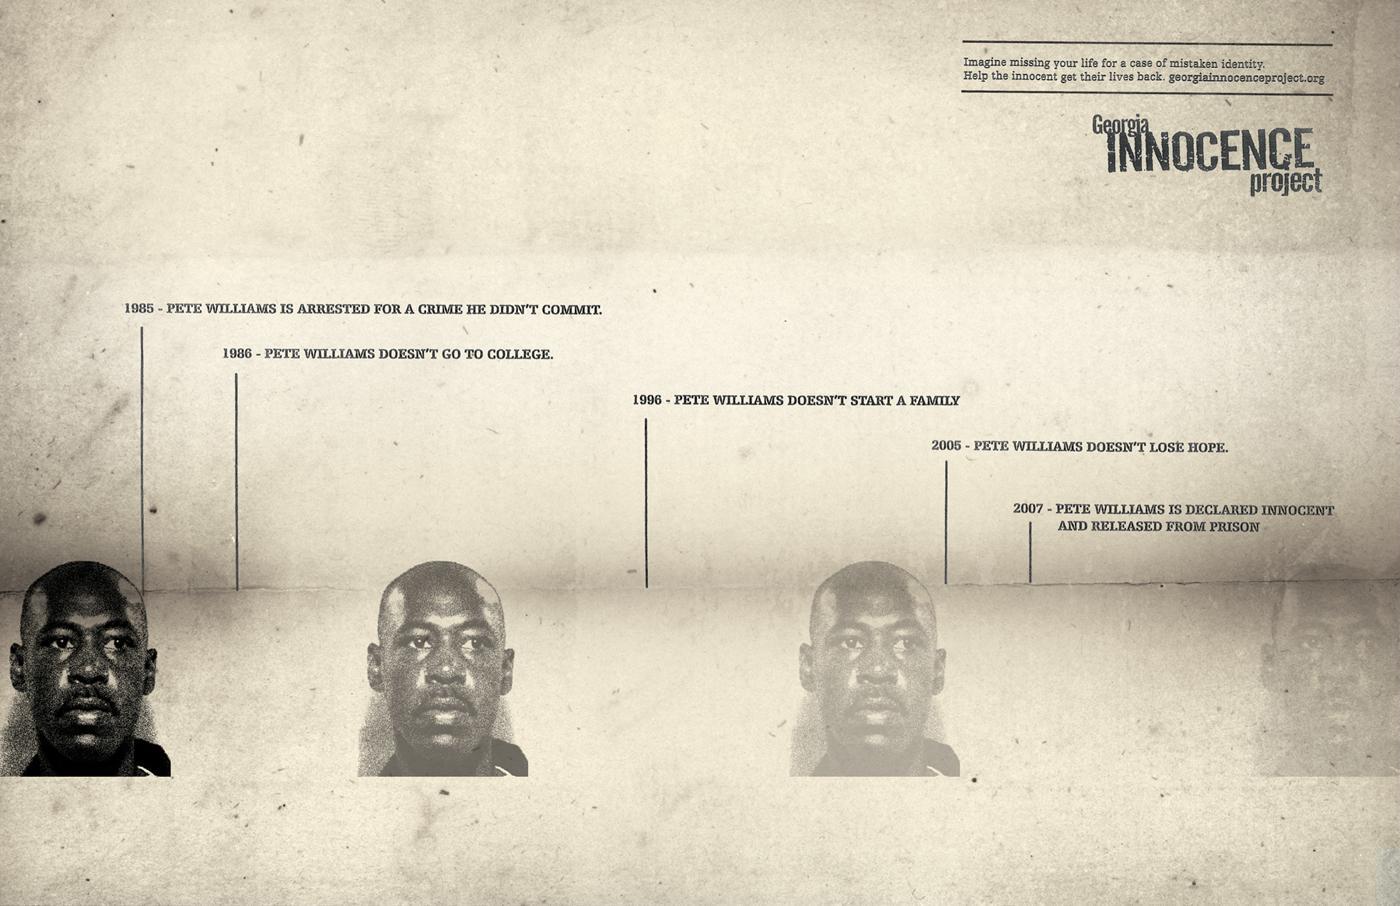 Georgia Innocence Project Print Ad -  Pete Williams